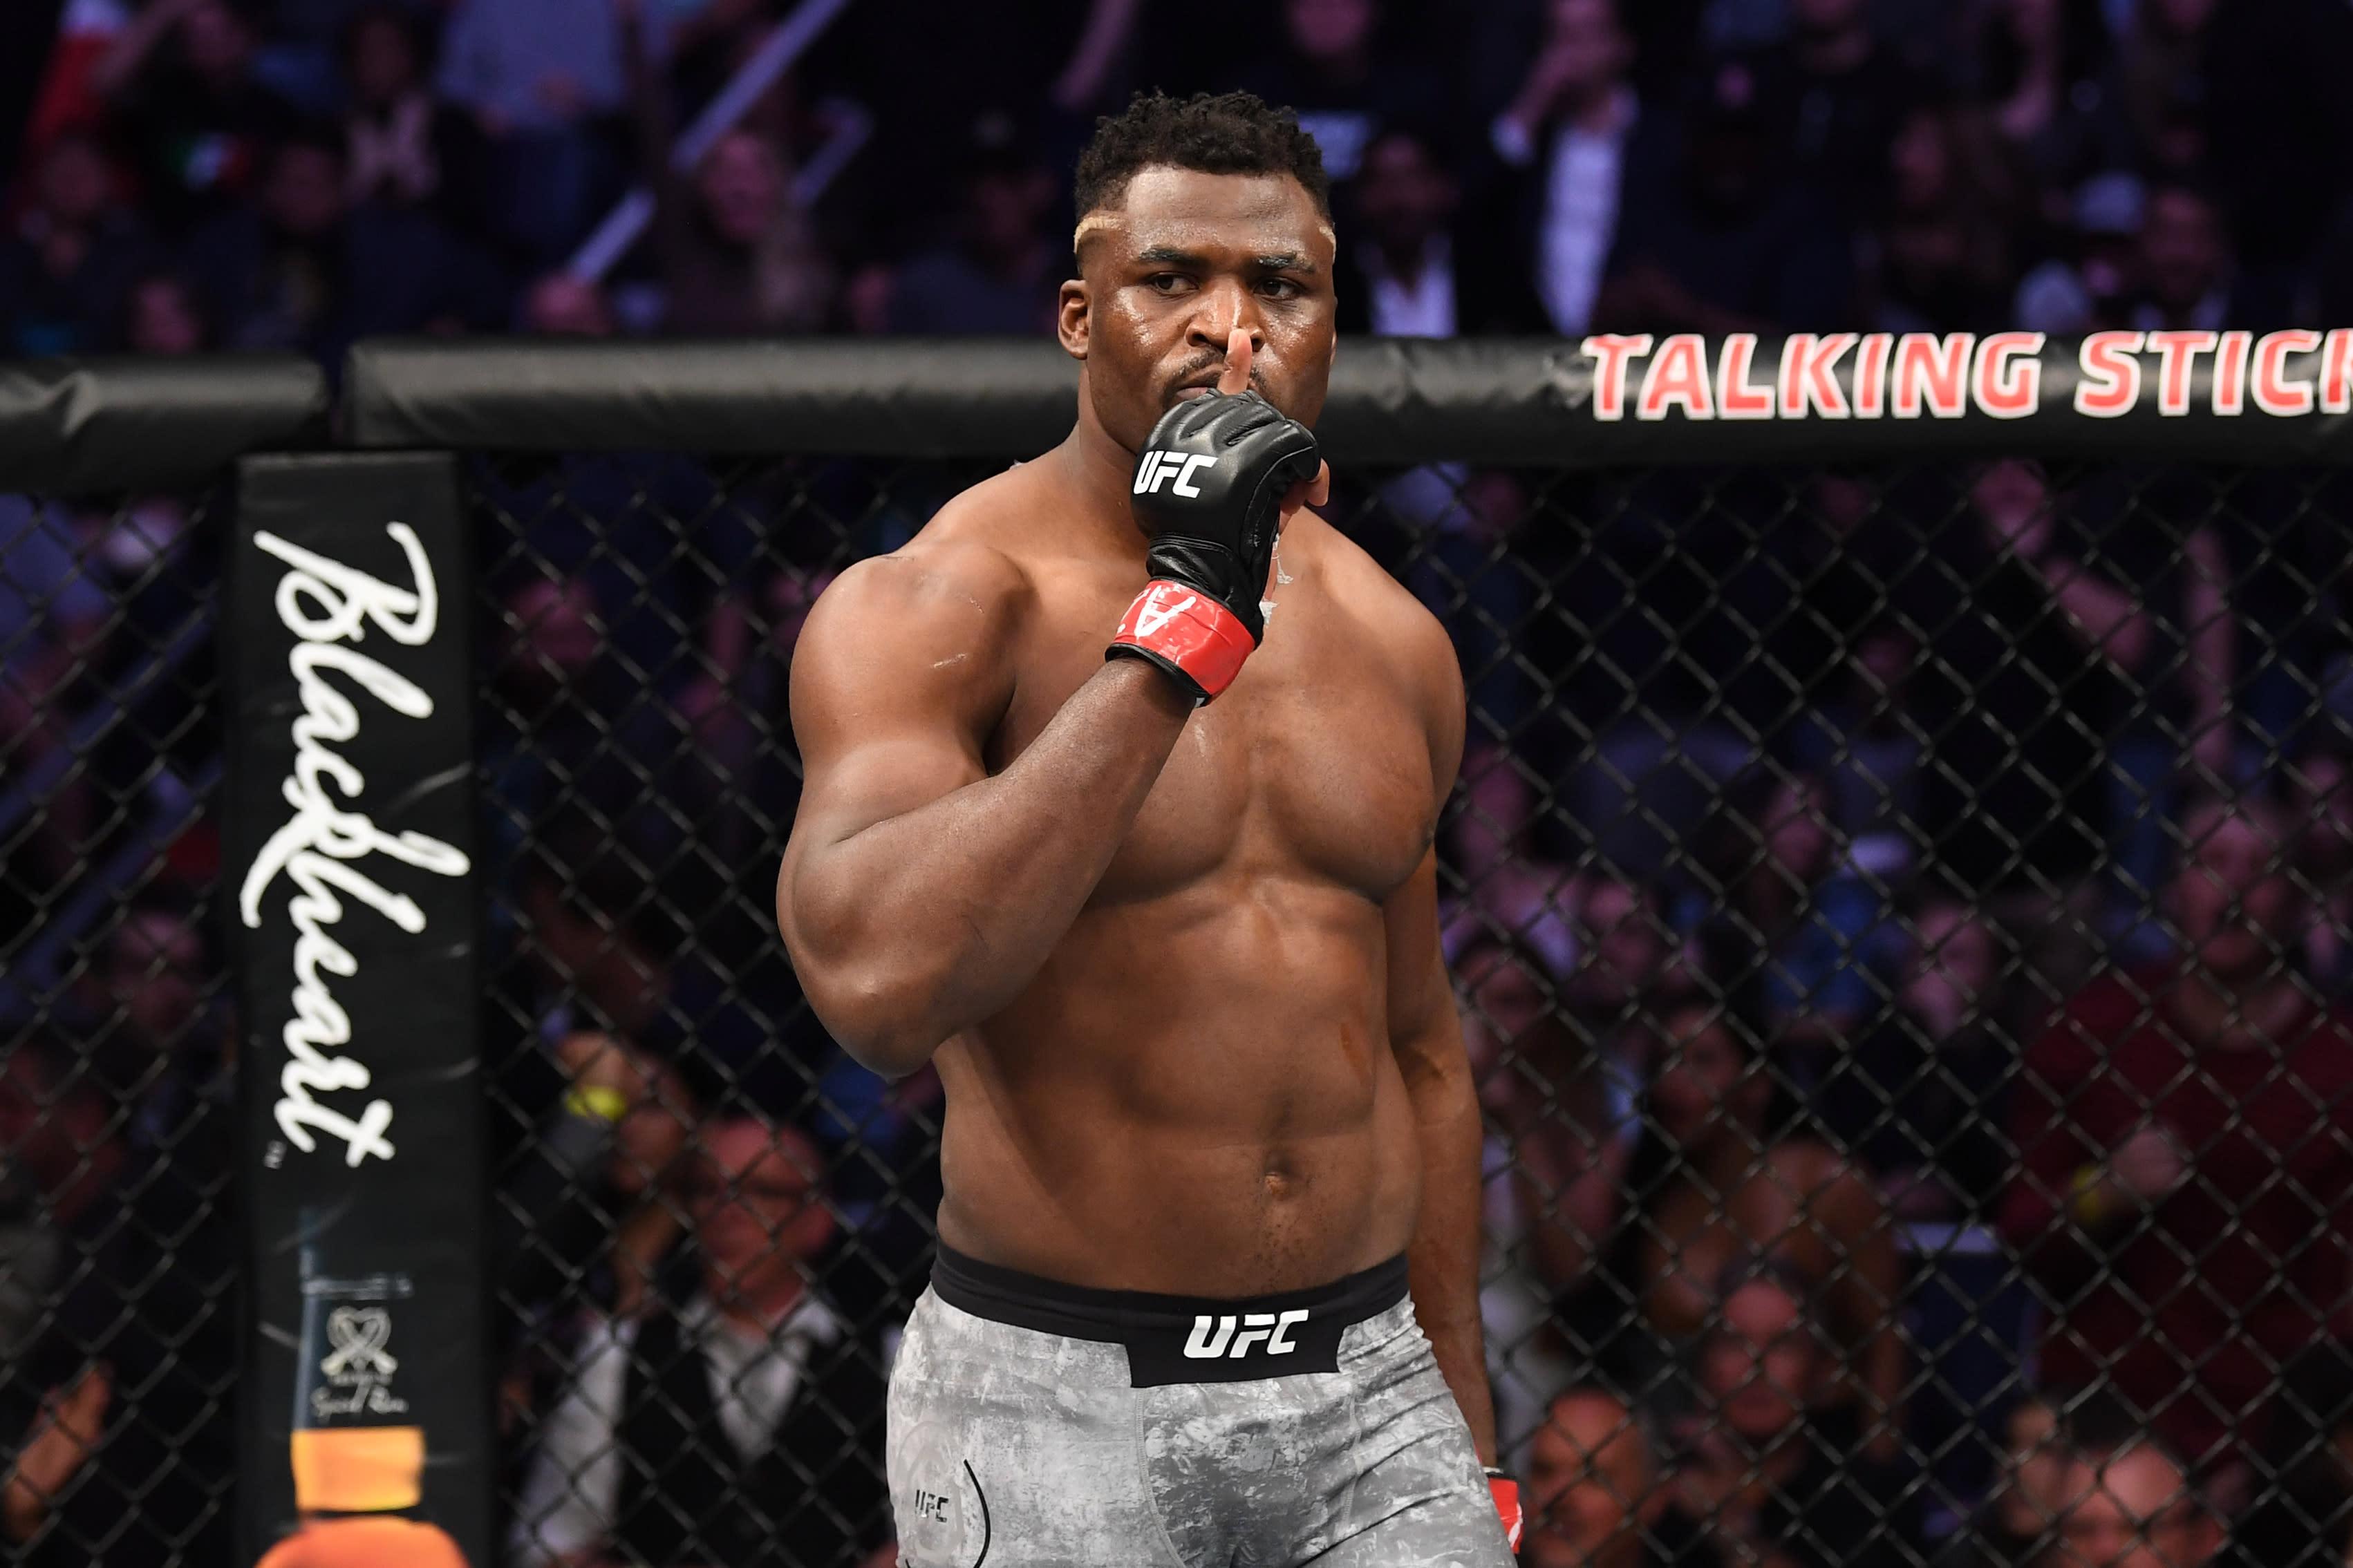 Cain Velasquez blames injury for loss; Ngannou disagrees - Yahoo Sports thumbnail